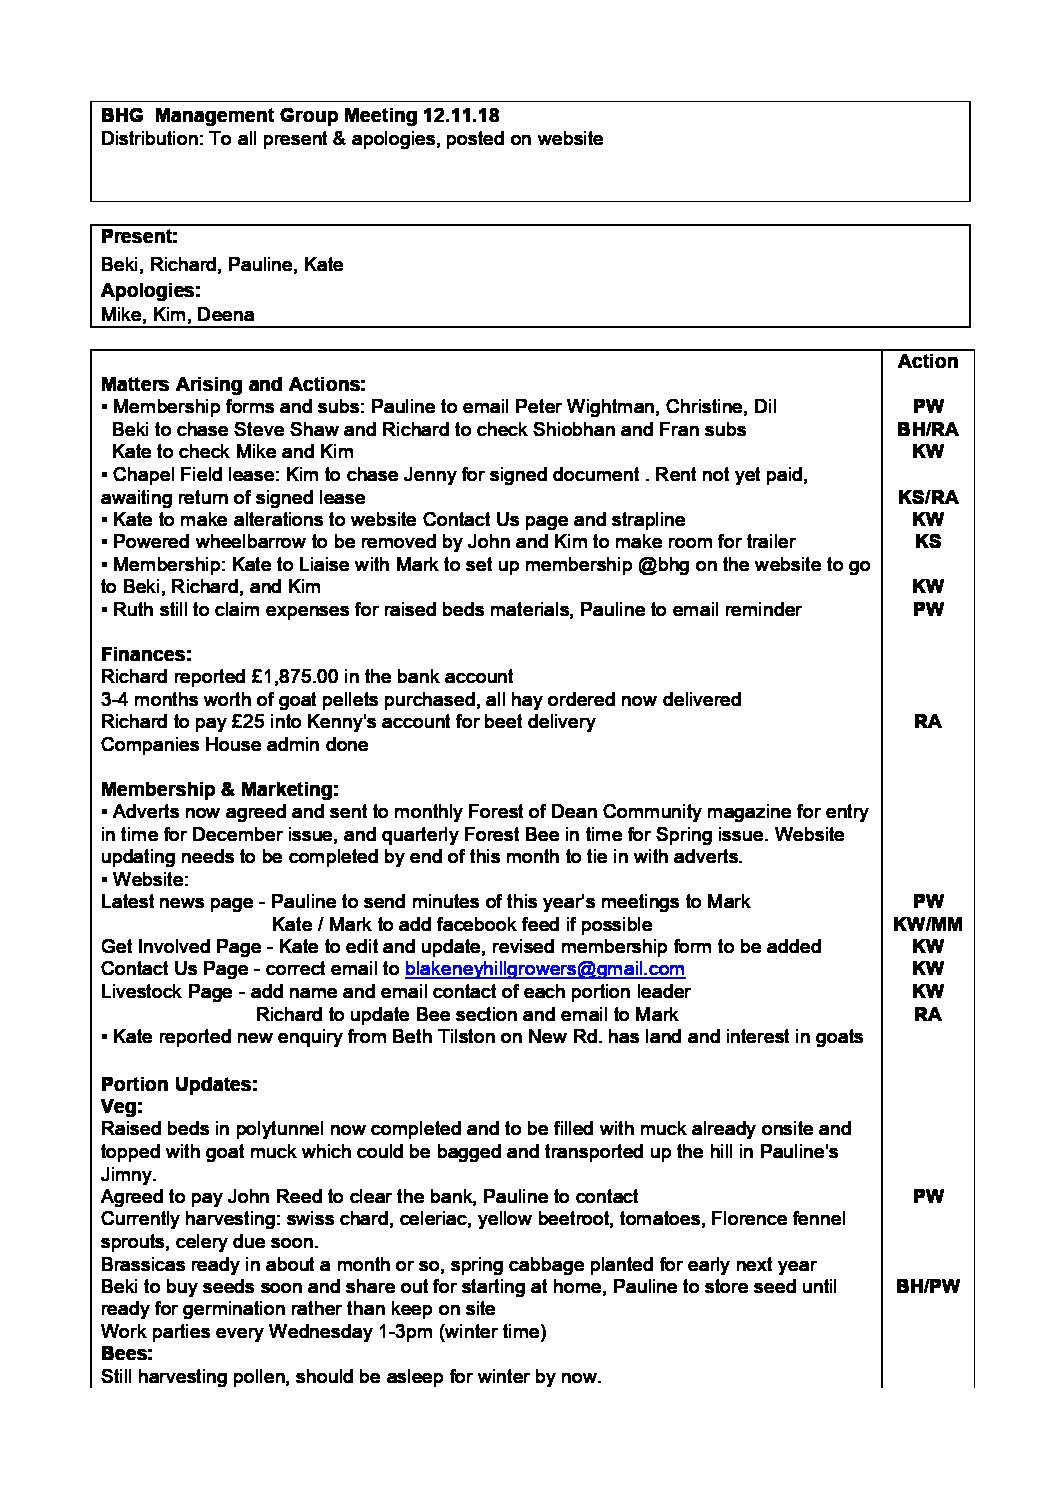 BHG-Minutes-12.11.18-pdf